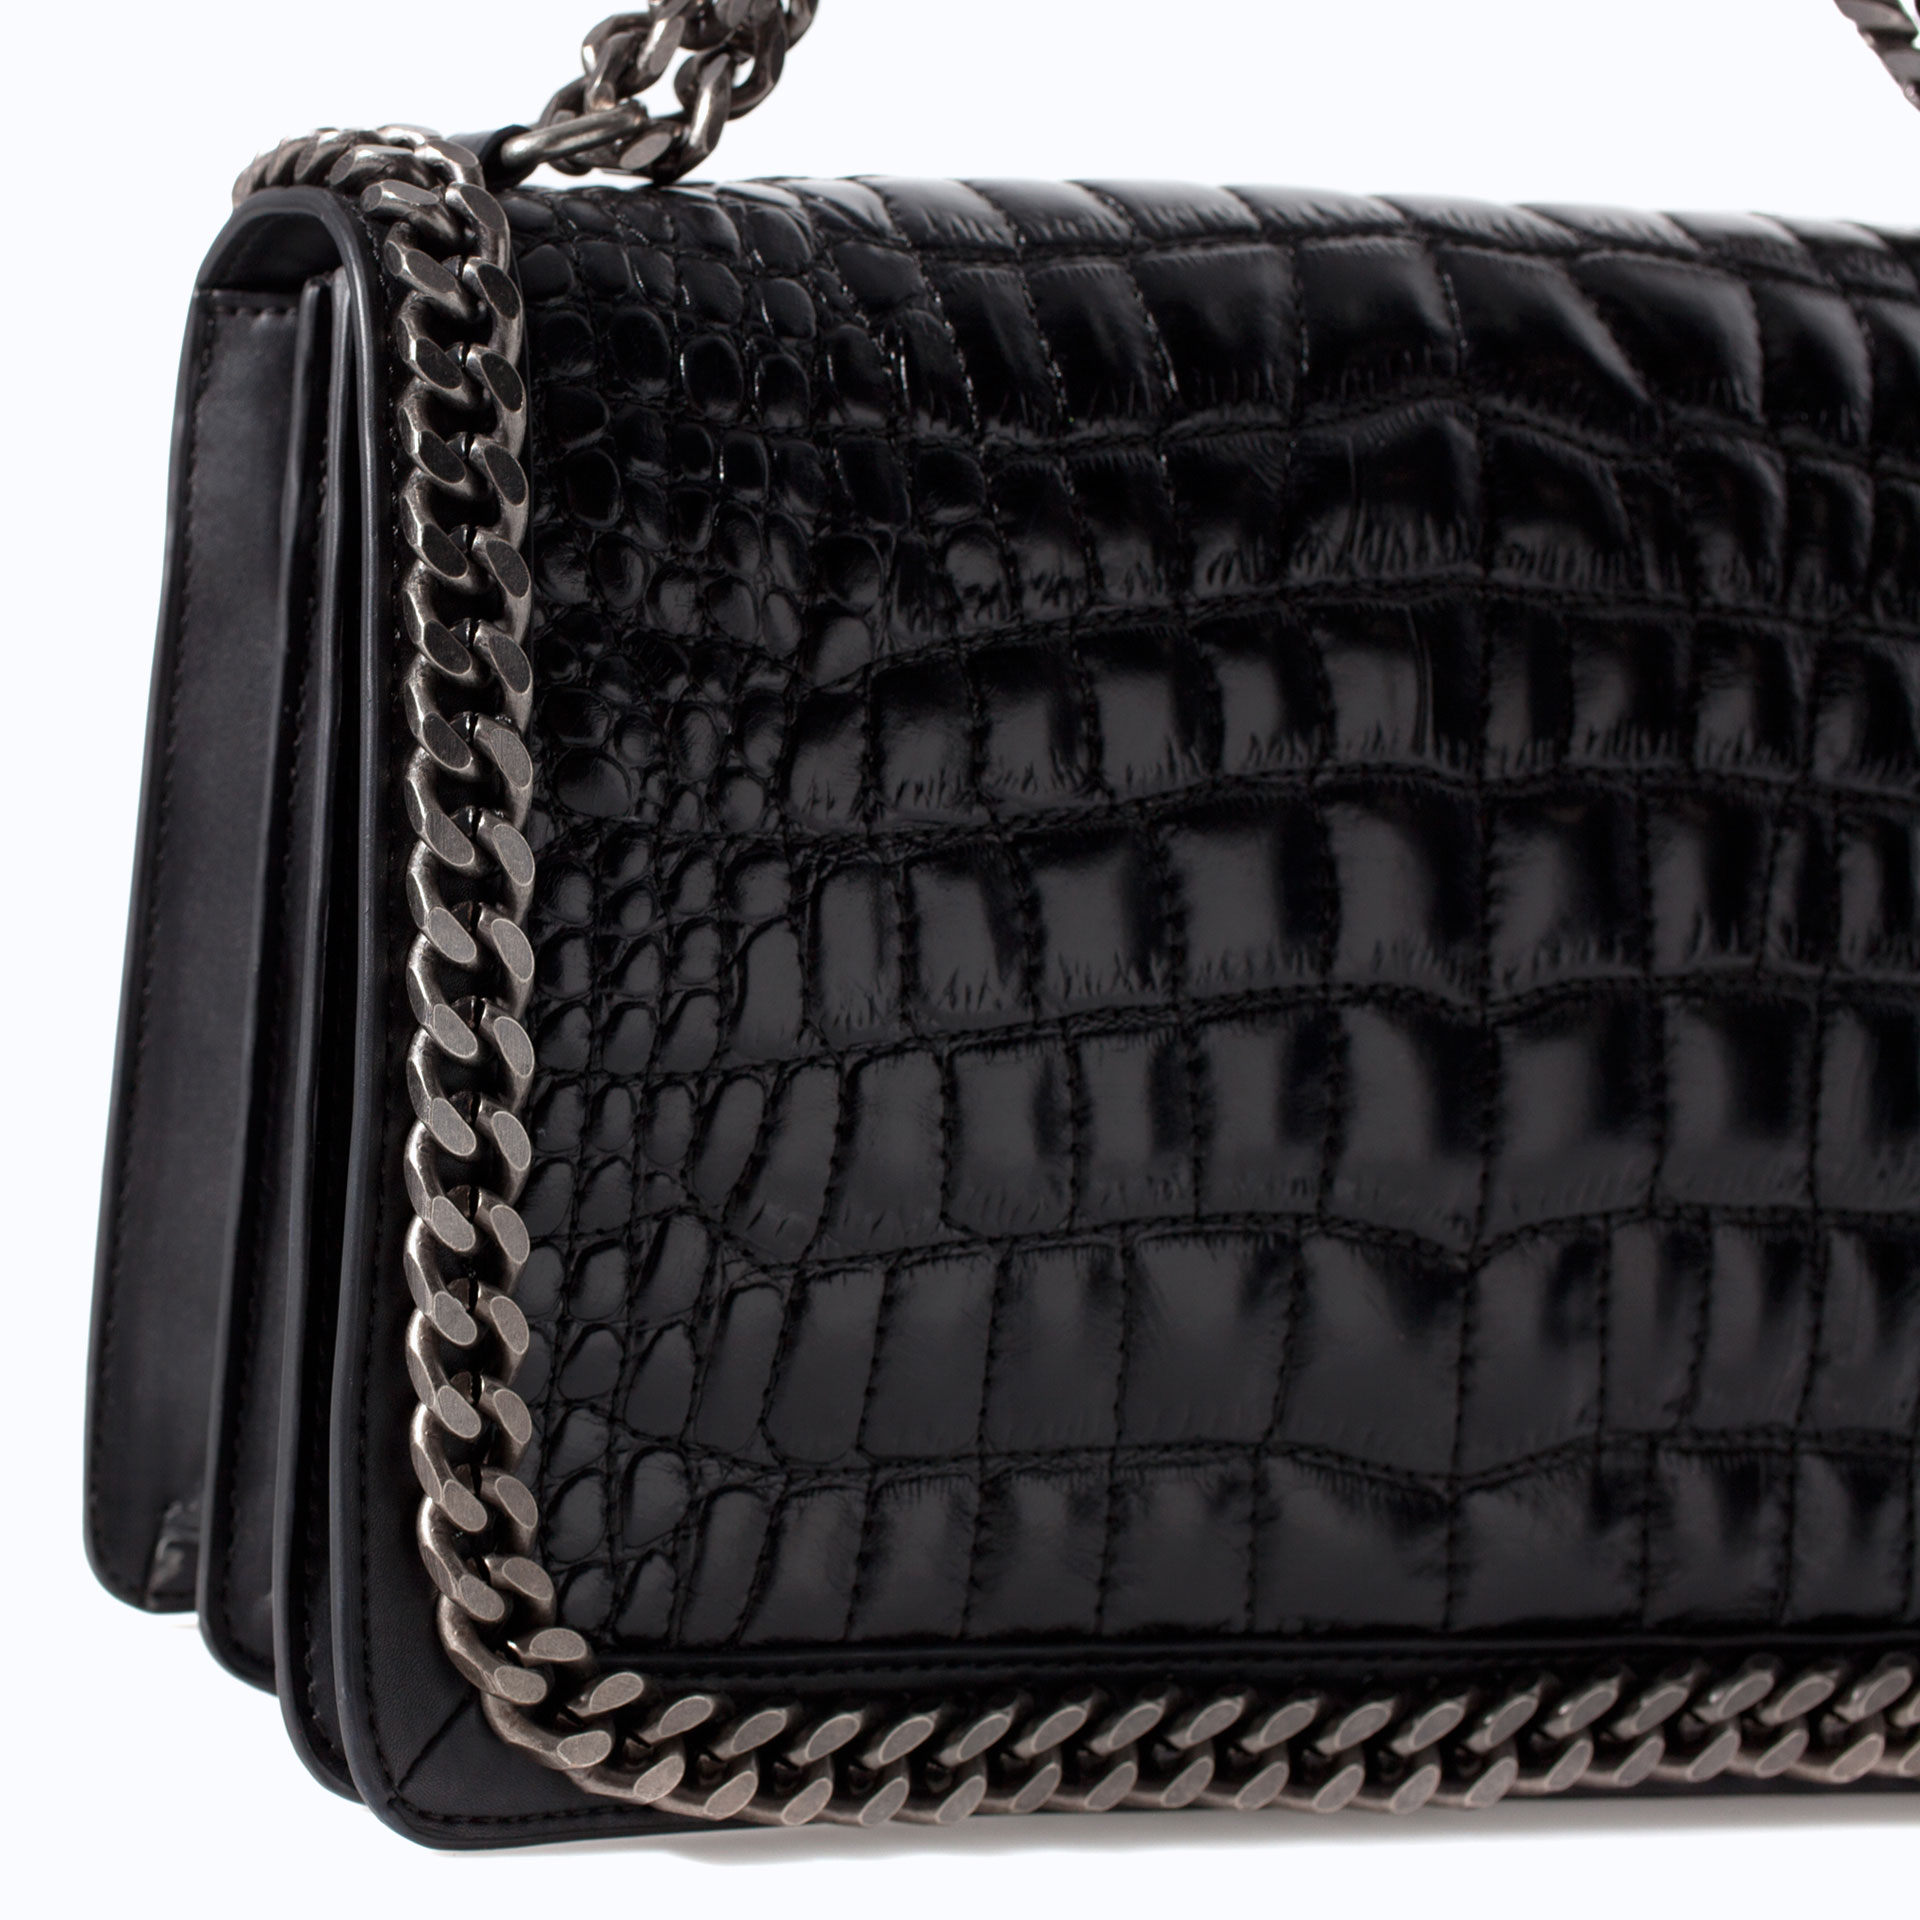 Monogram Small Croc Stamped Shoulder Bag White Ysl Y